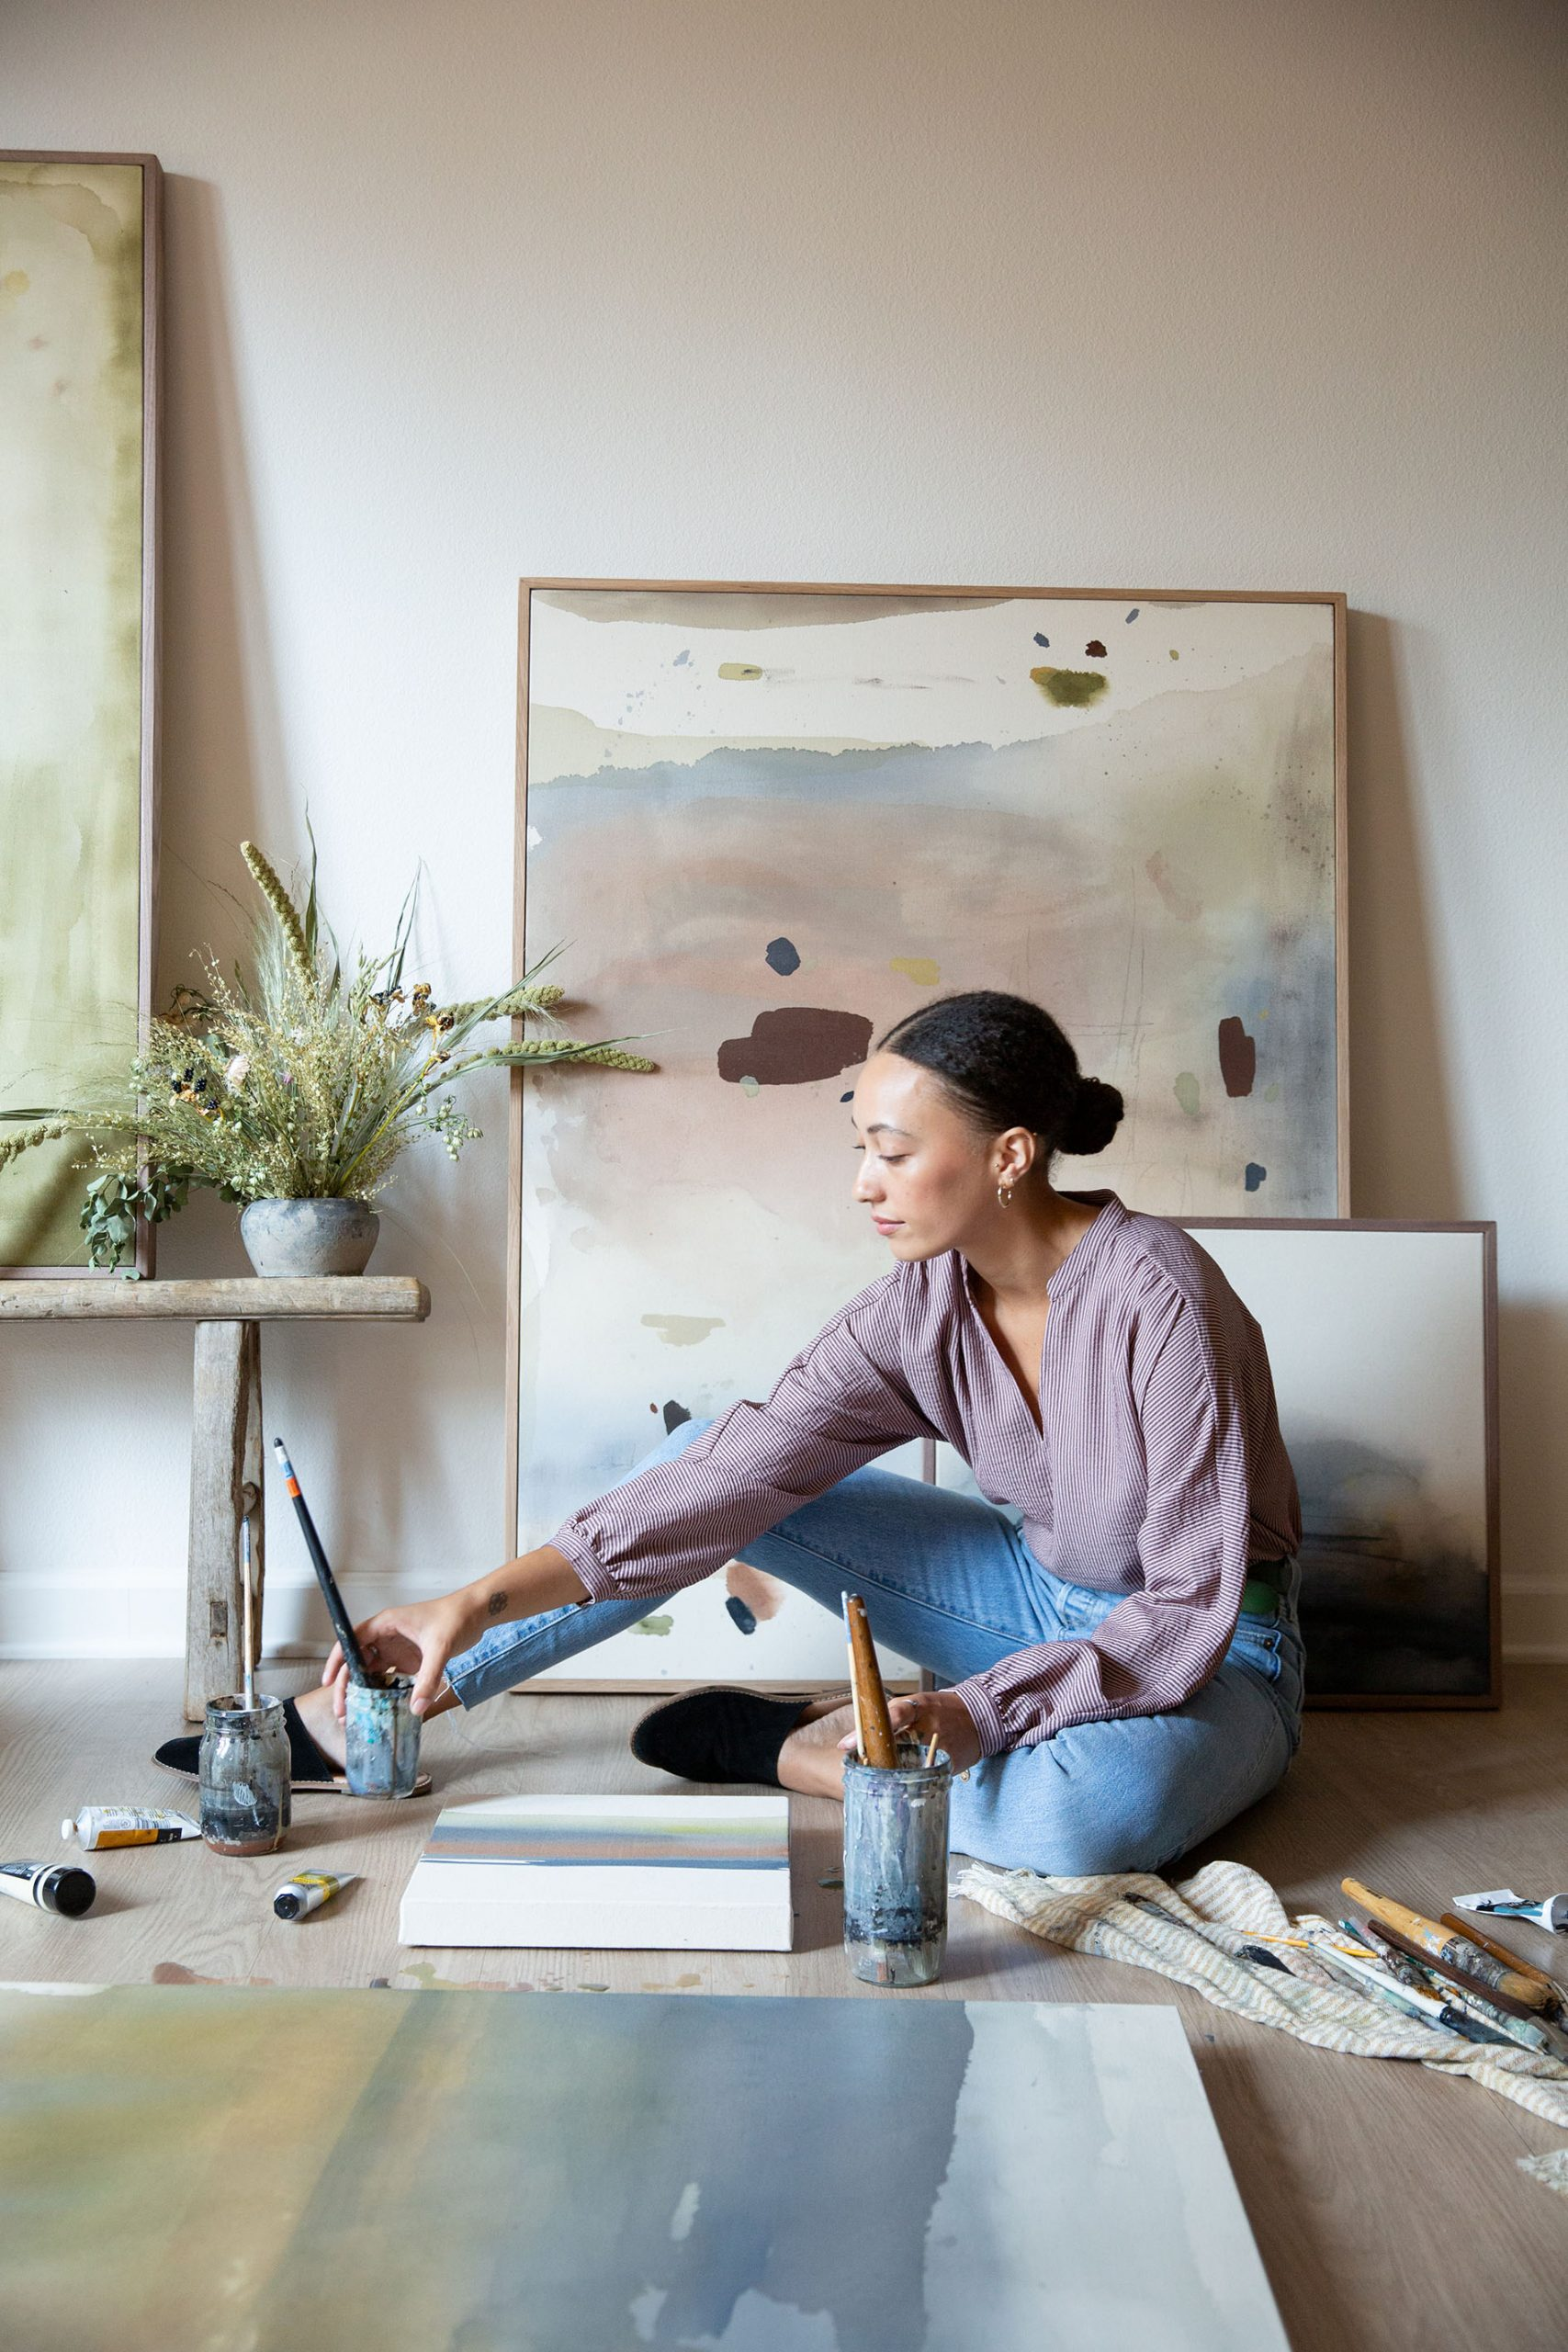 A Conversation With Jordan Nicole of High Desert Studio